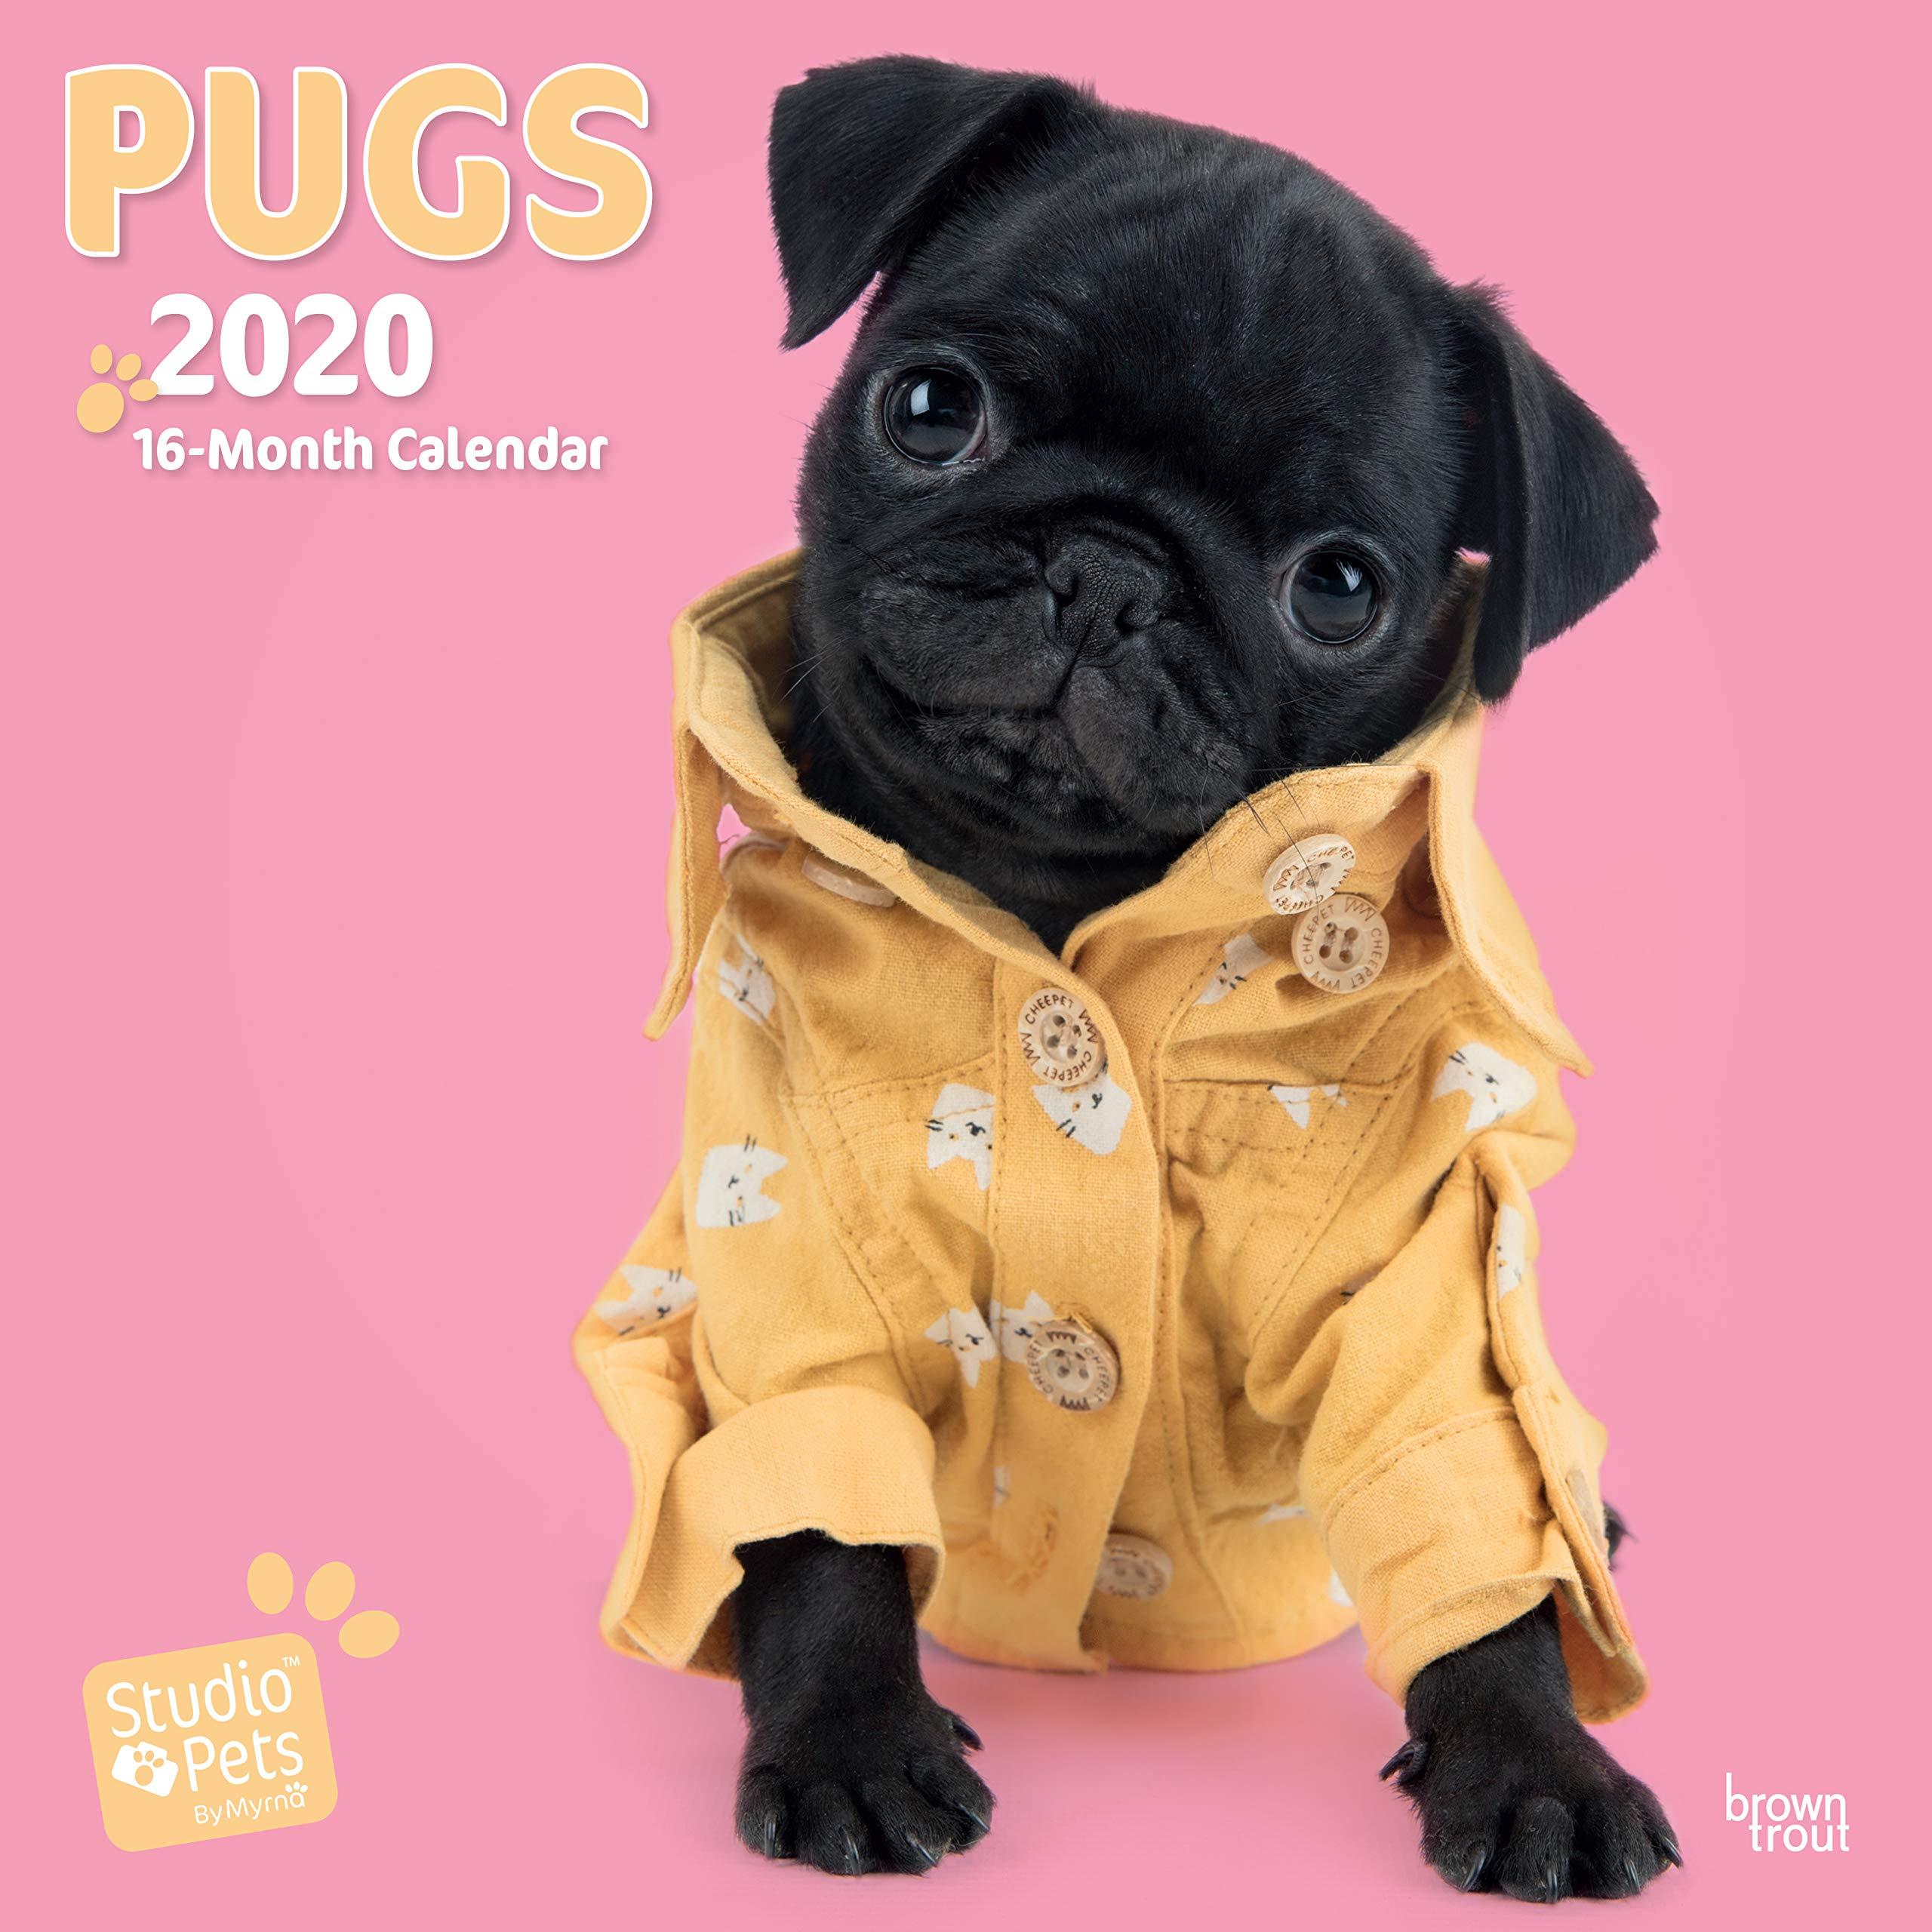 Pugs 2020 Square Wall Calendar Studio Pets Huijing Myrna 9781789930863 Amazon Com Books